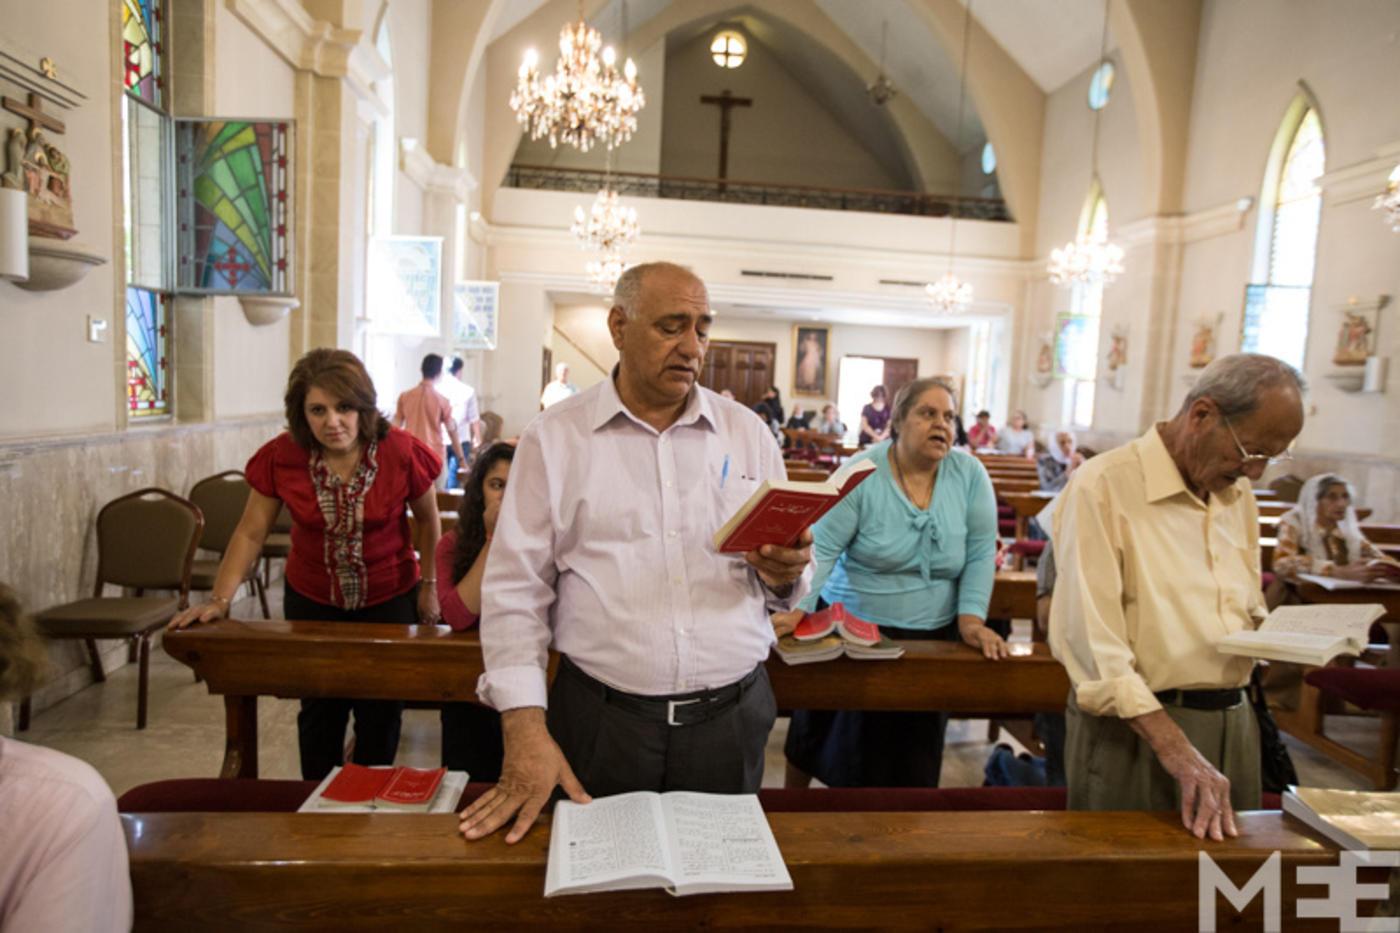 Iraqi Christians flee IS to find refuge inside Jordan churches | Middle East  Eye